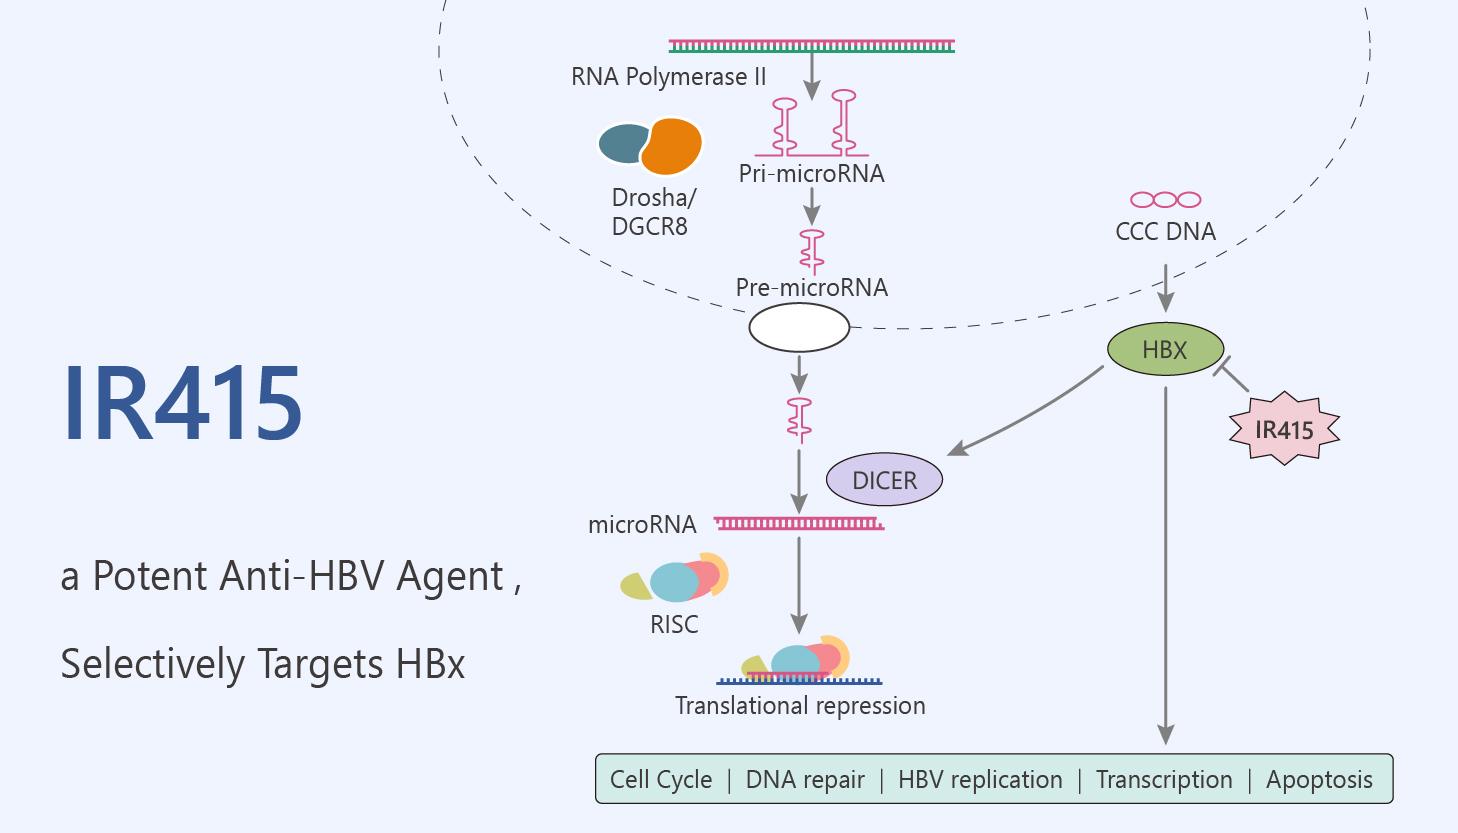 IR415 a potent Anti HBV Agent Selectively Targets HBx 2020 05 20 - IR415, a Potent Anti-HBV Agent , Selectively Targets HBx